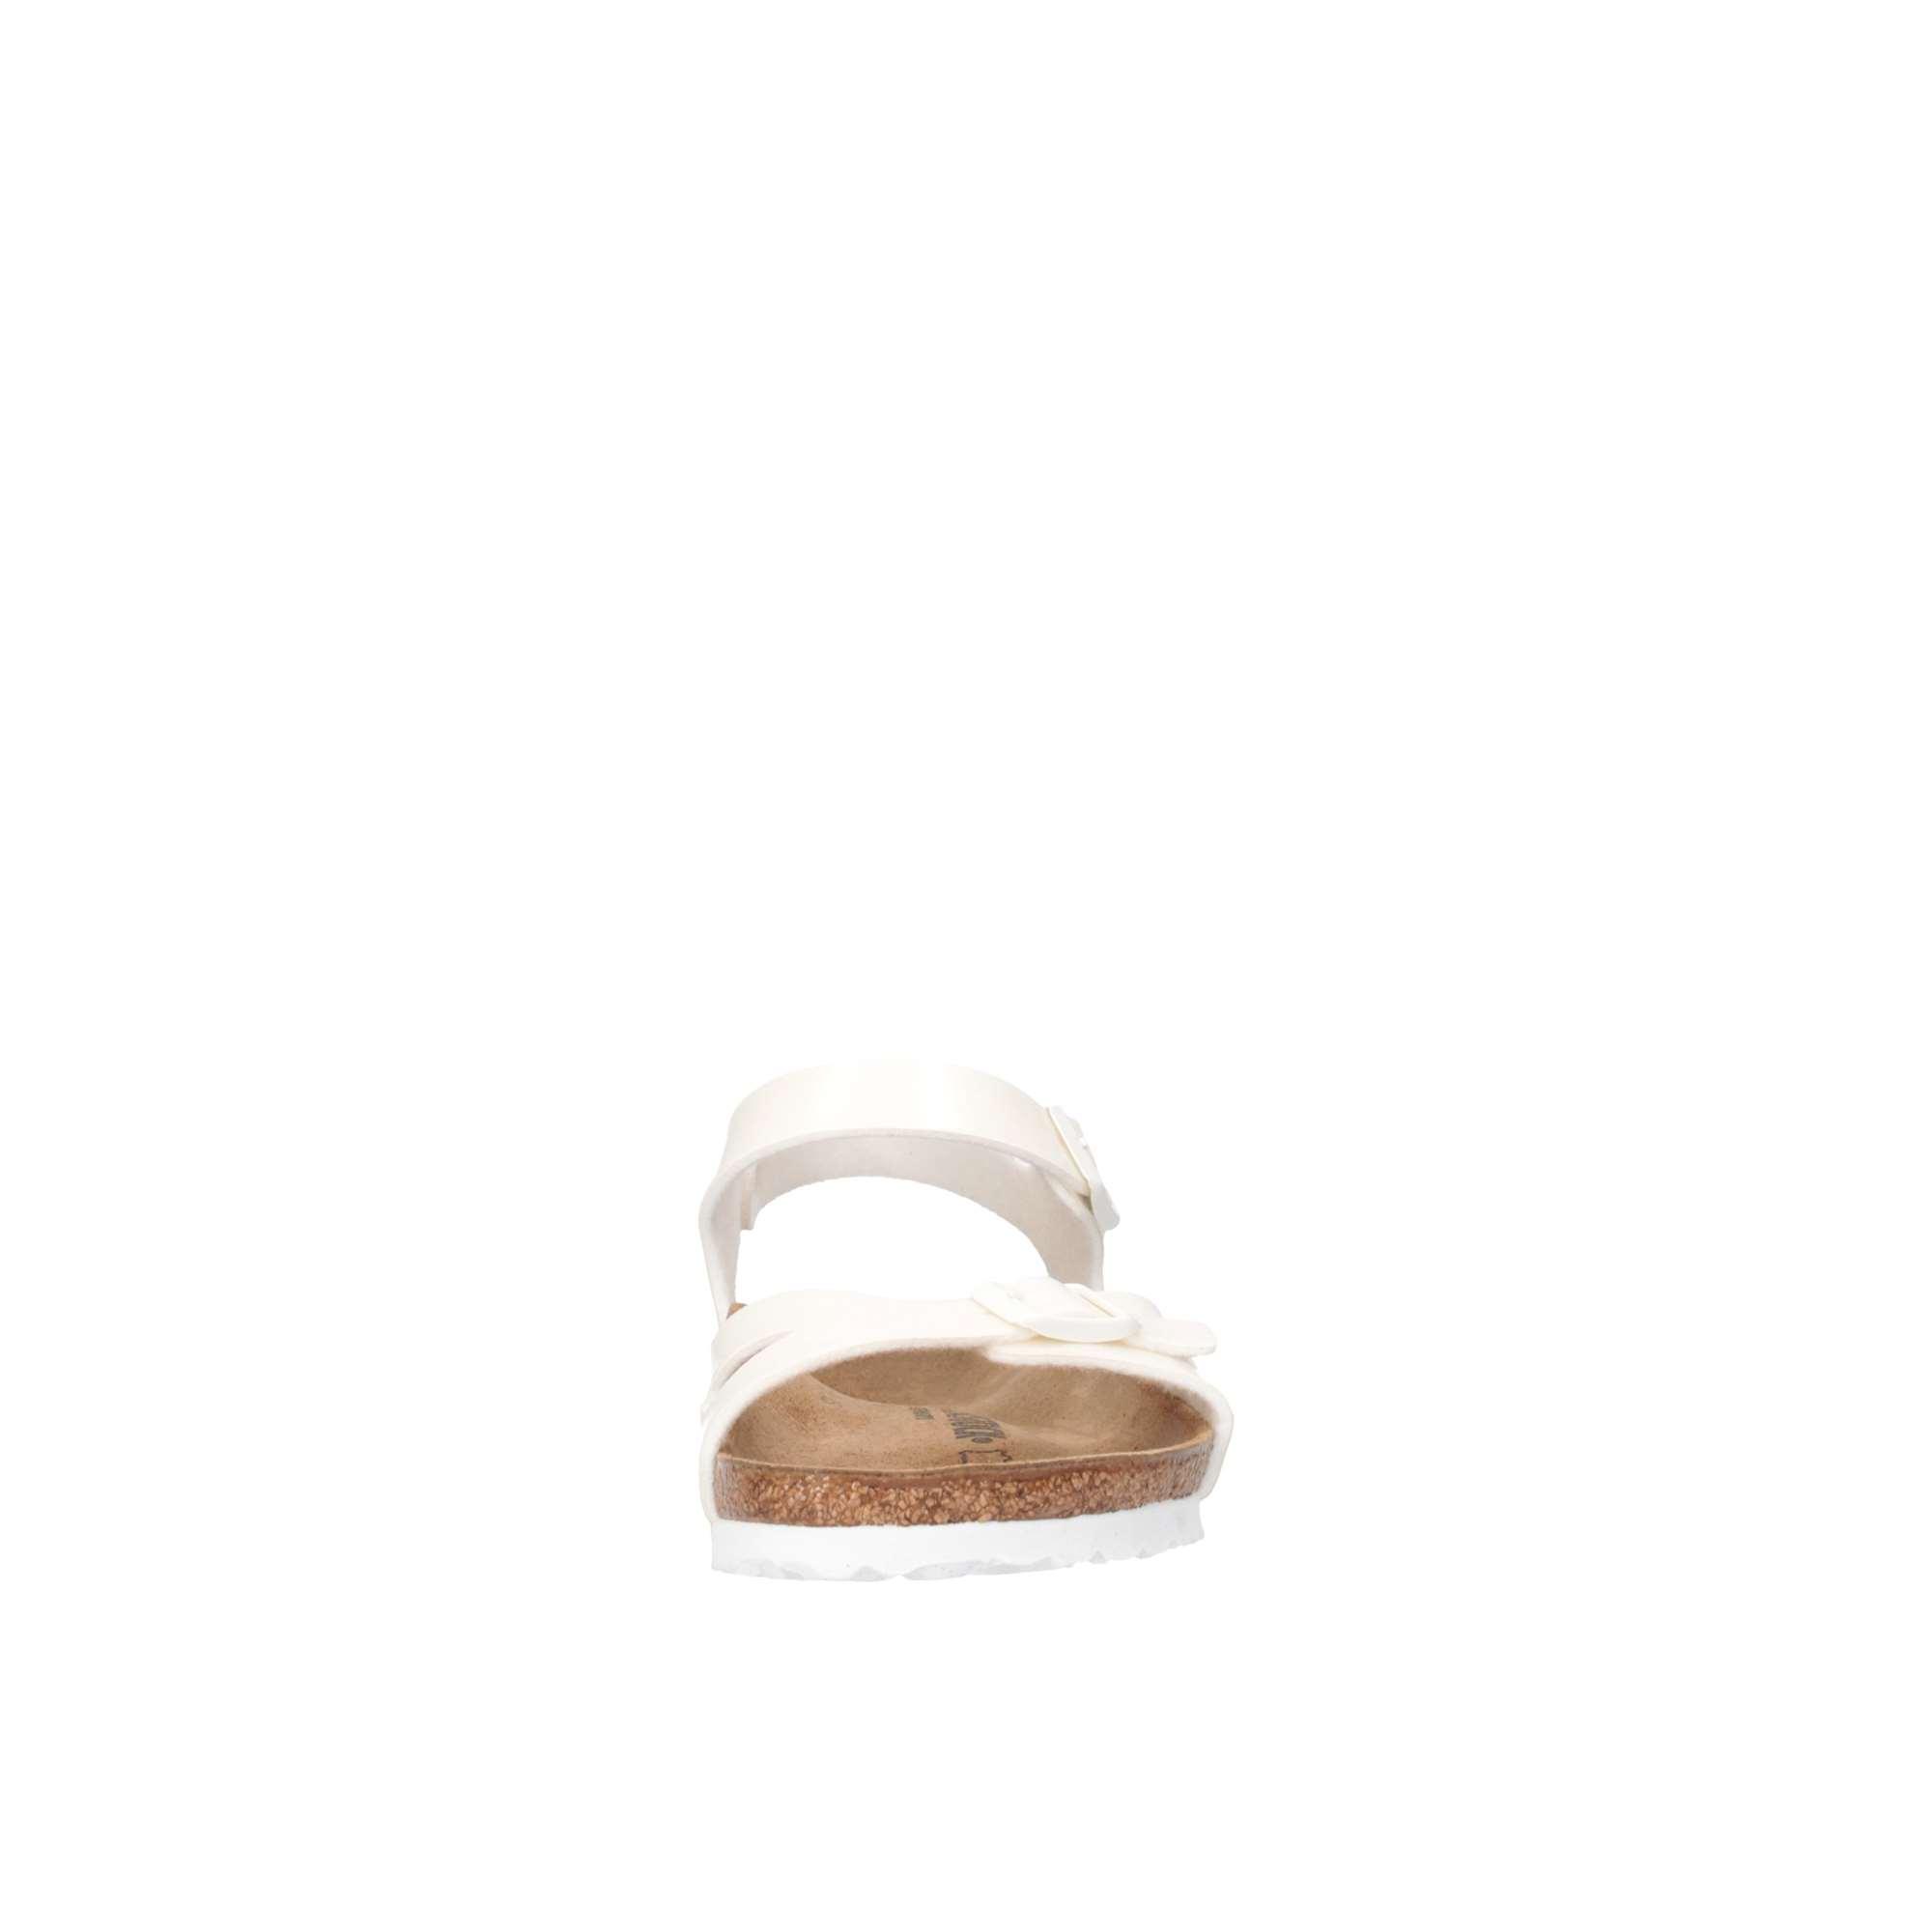 Birkenstock Sandals Bianco | Sandals Woman | Experya